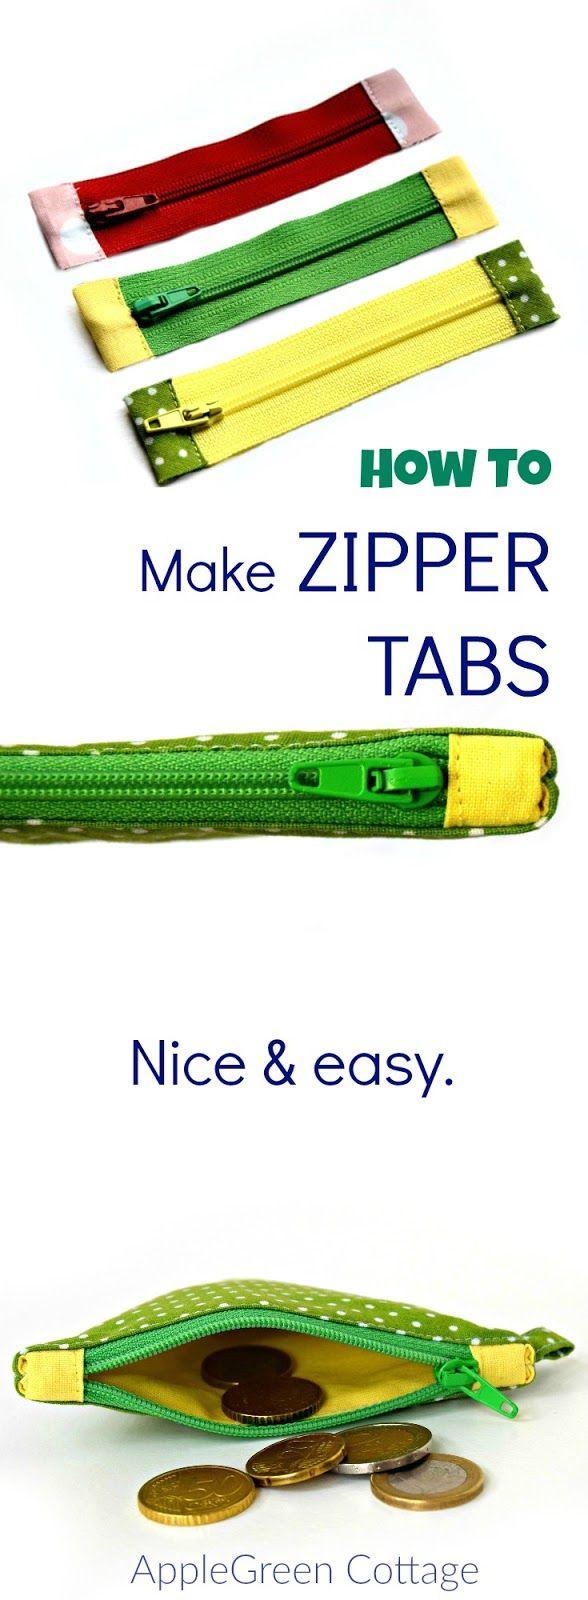 how to shorten zippers and make zipper tabs sy s mnad och v skor. Black Bedroom Furniture Sets. Home Design Ideas